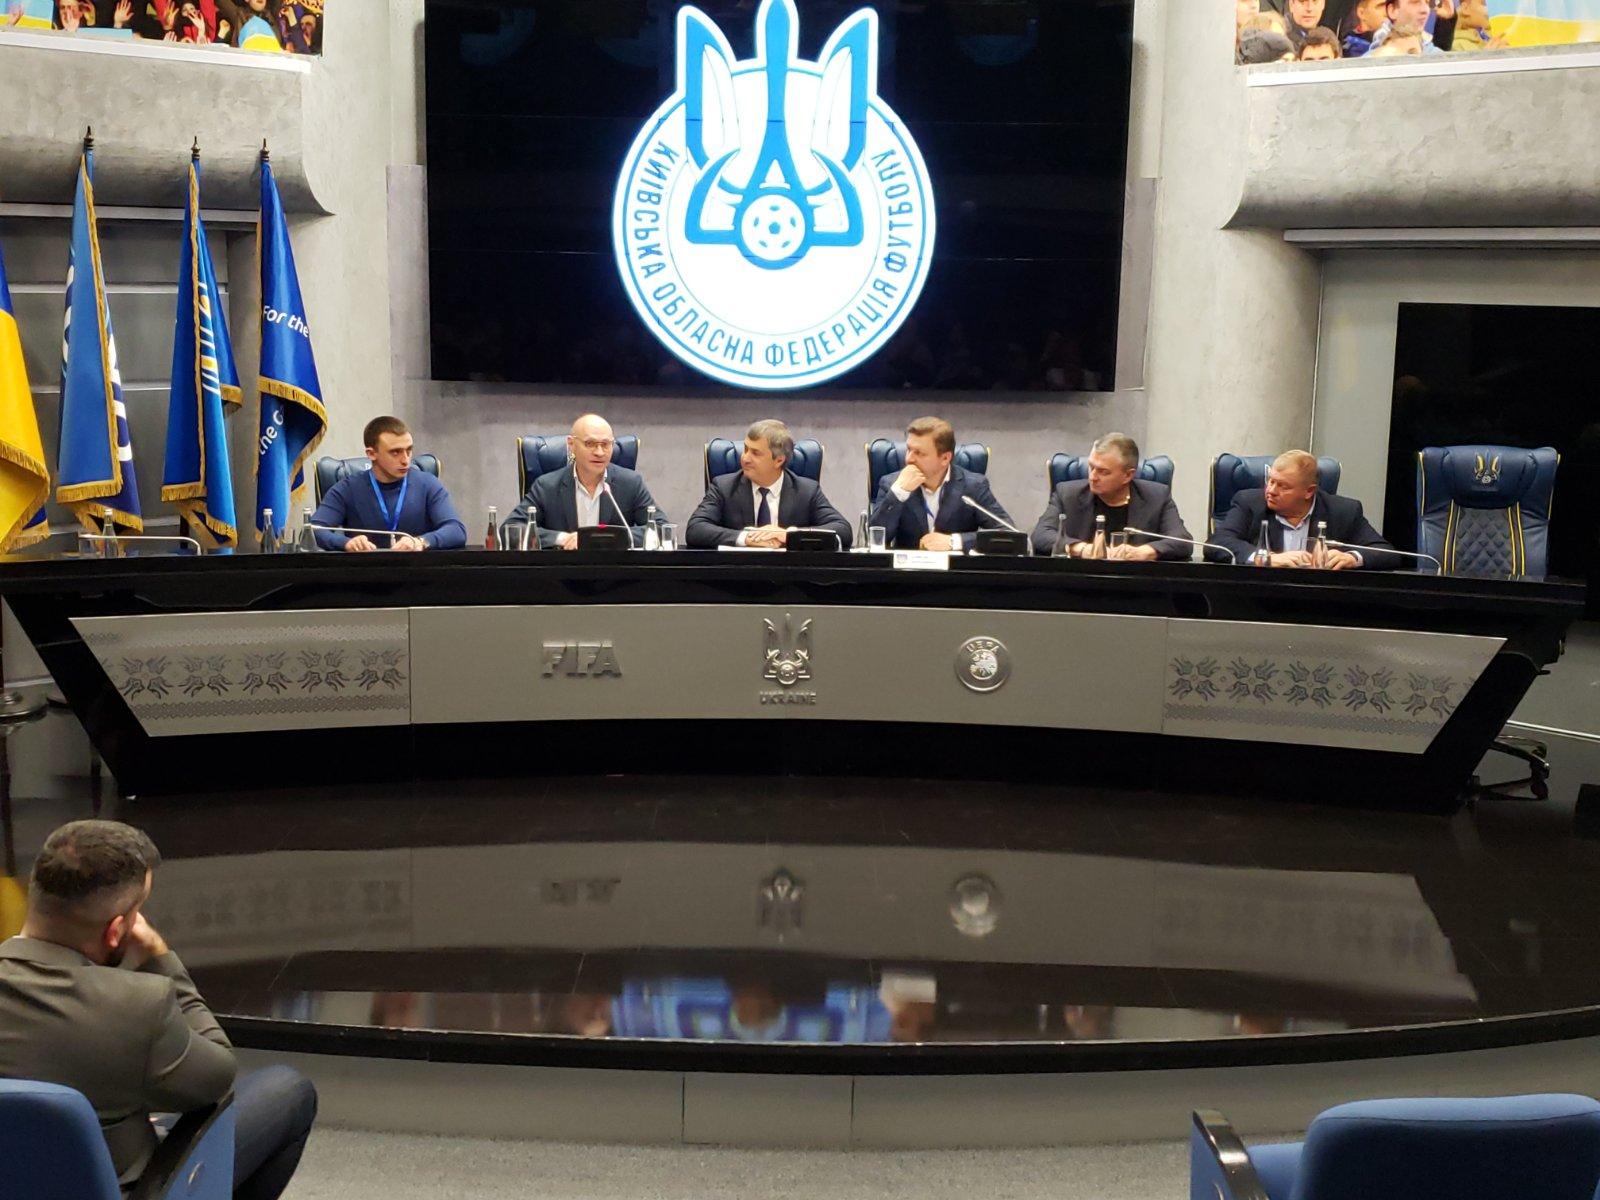 Київська обласна федерація футболу стала асоціацією -  - yzobrazhenye viber 2020 01 18 17 07 16